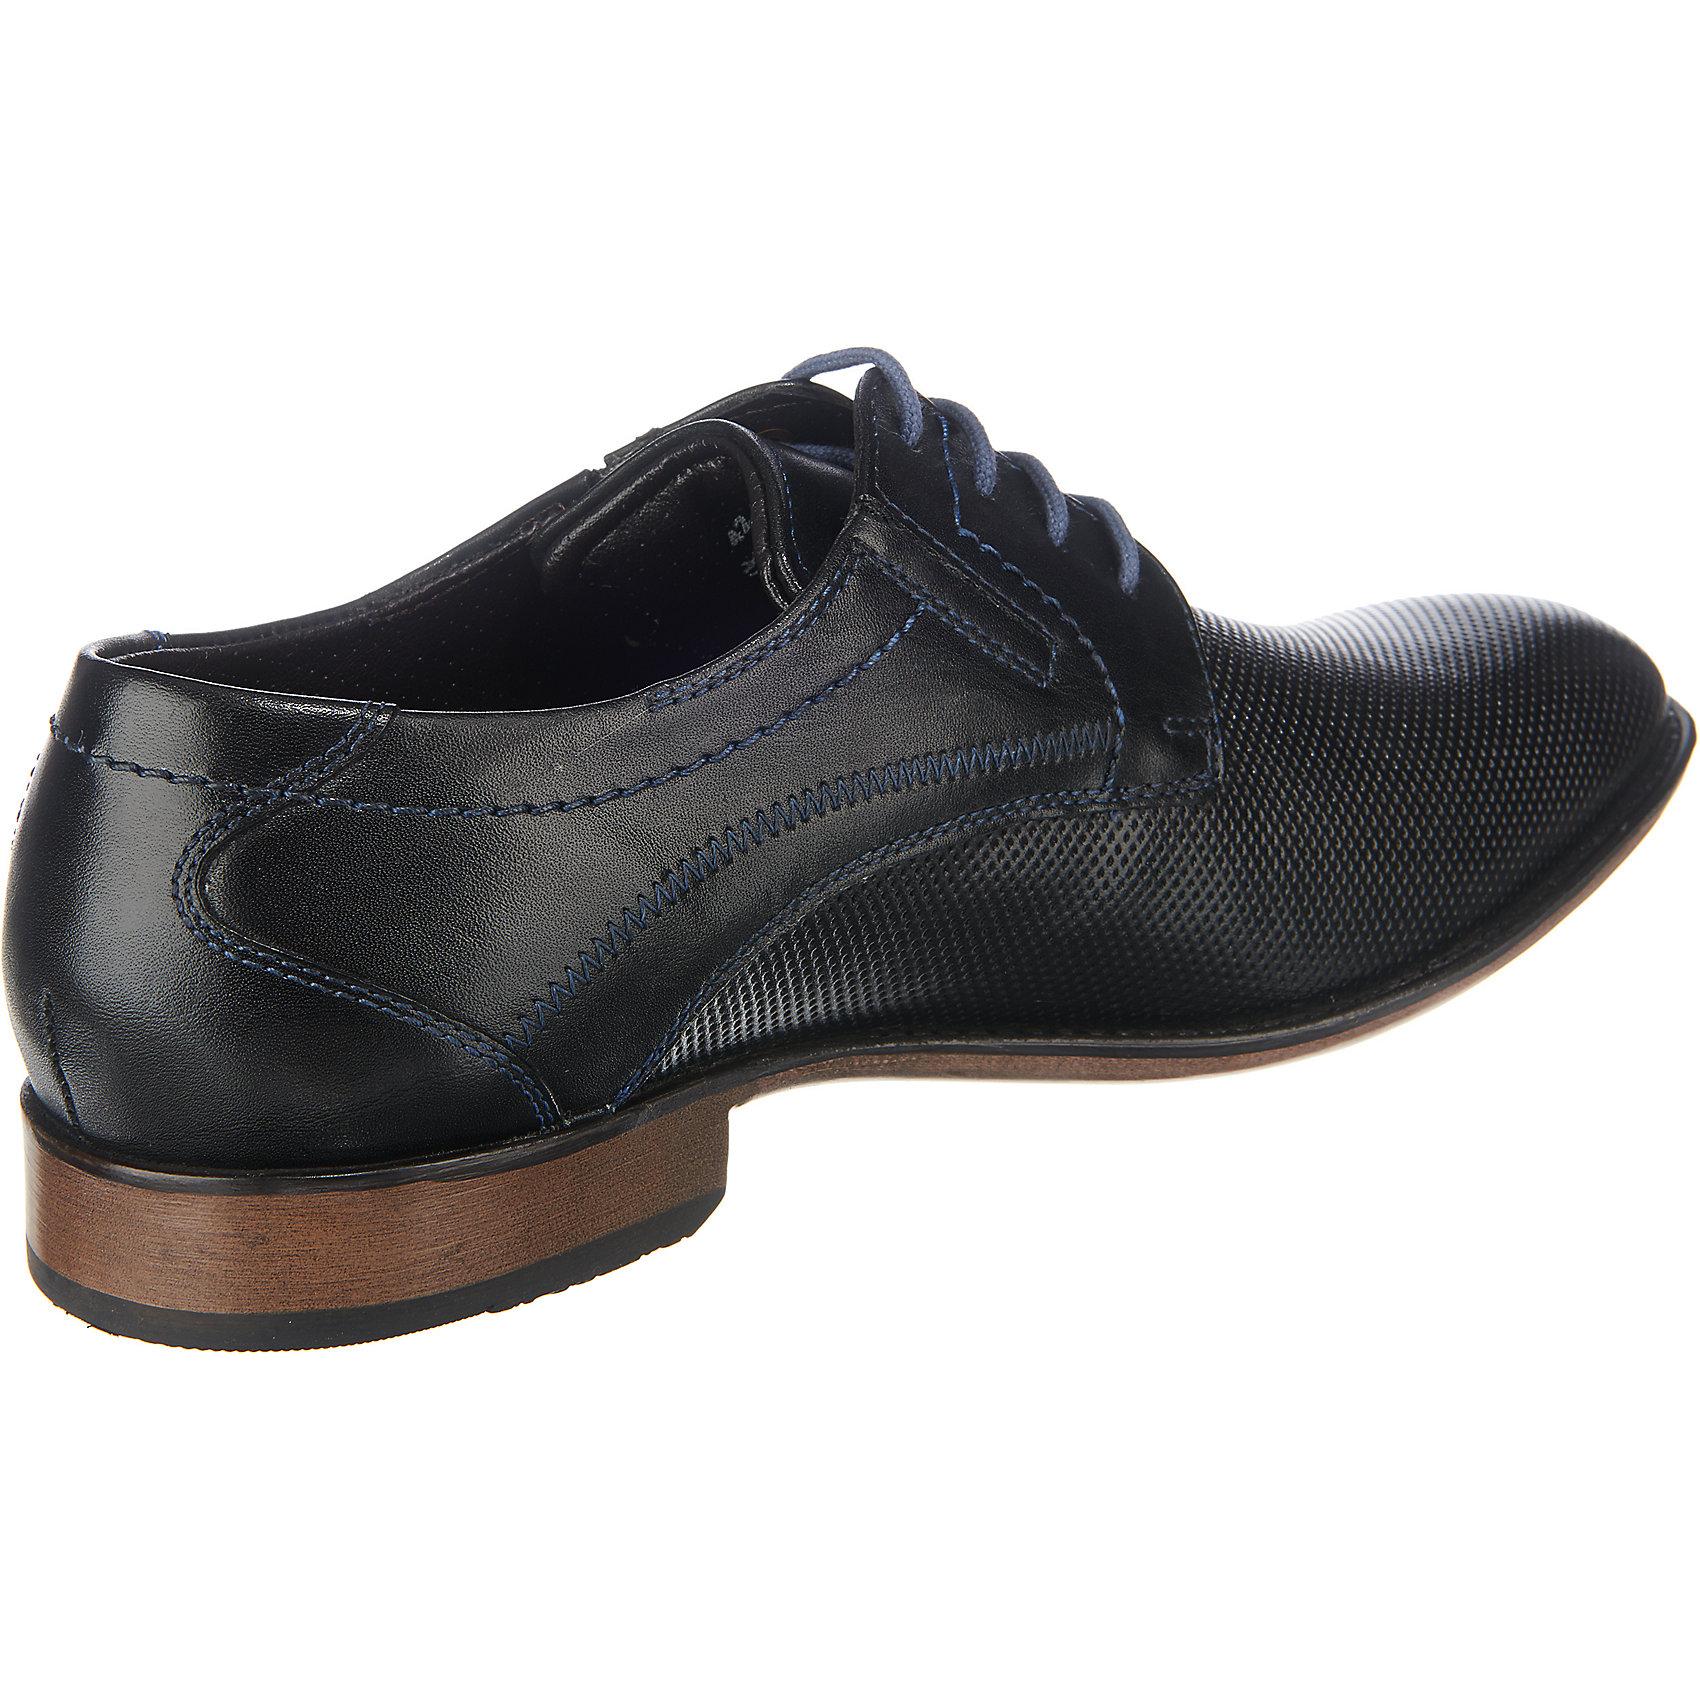 factory price ea52d 5d22a Neu bugatti Business Schuhe Herren 5771226 für Herren Schuhe ...